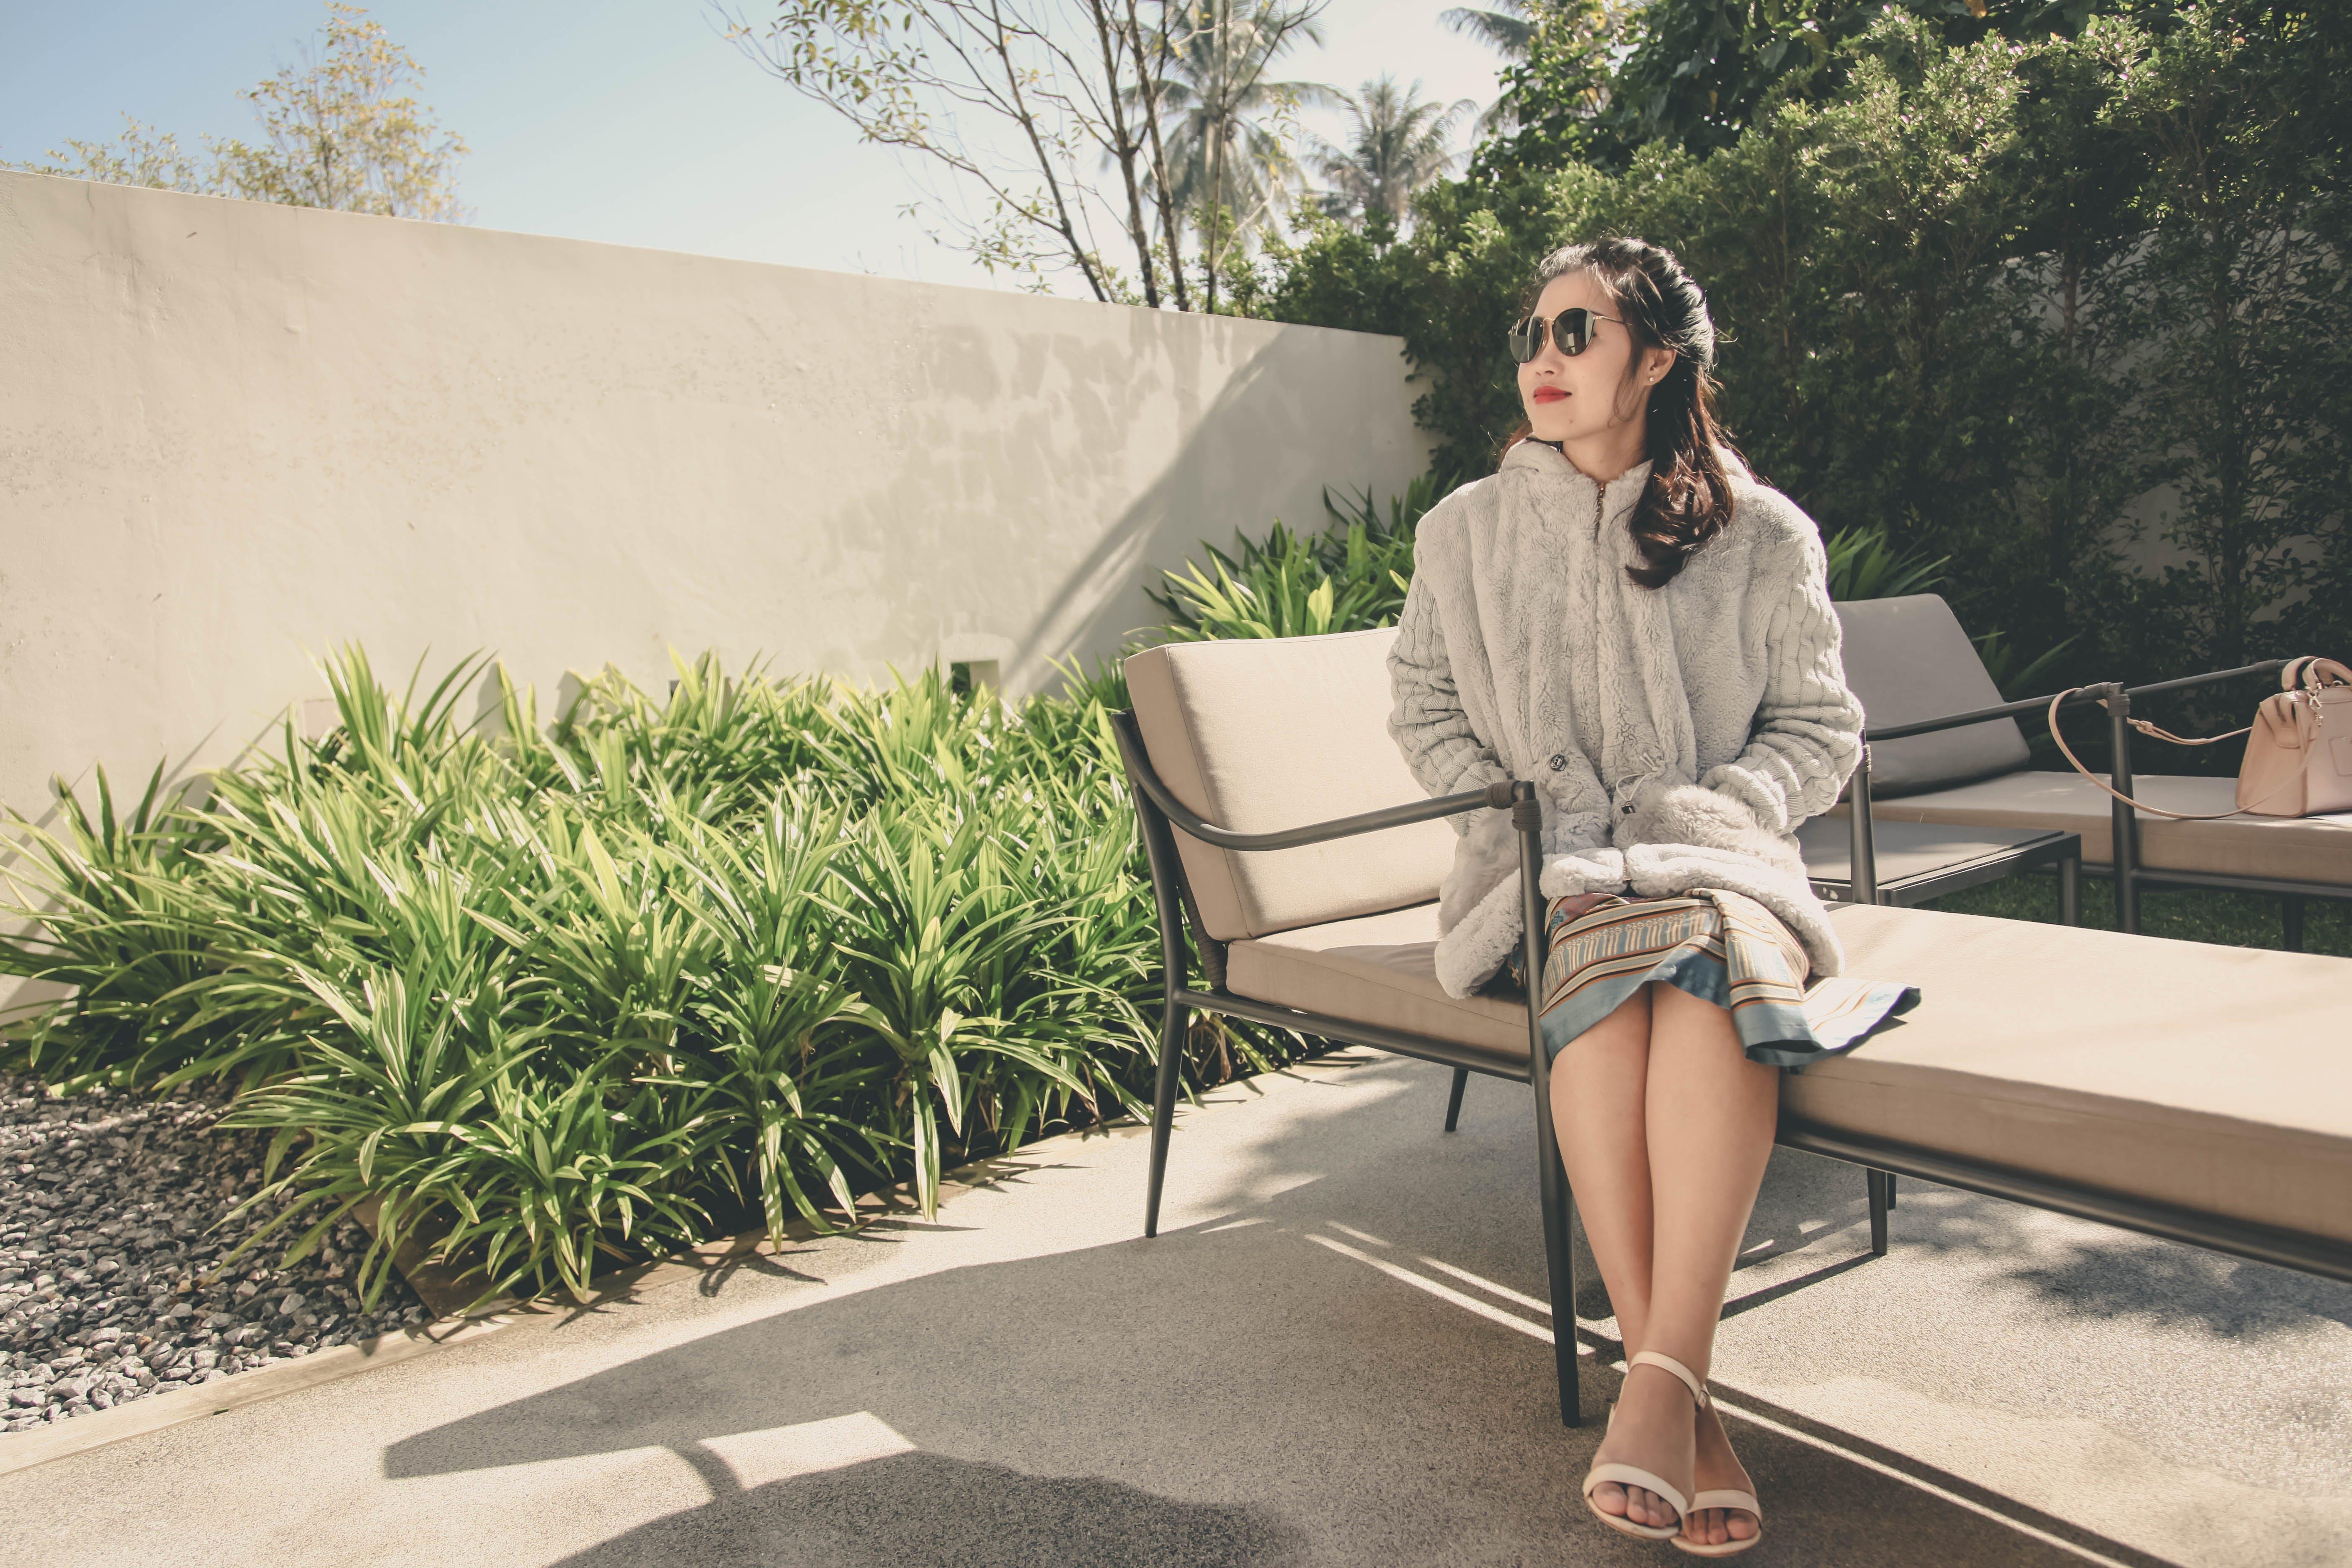 Woman Wearing Hoodie Sitting on Lounge Chair